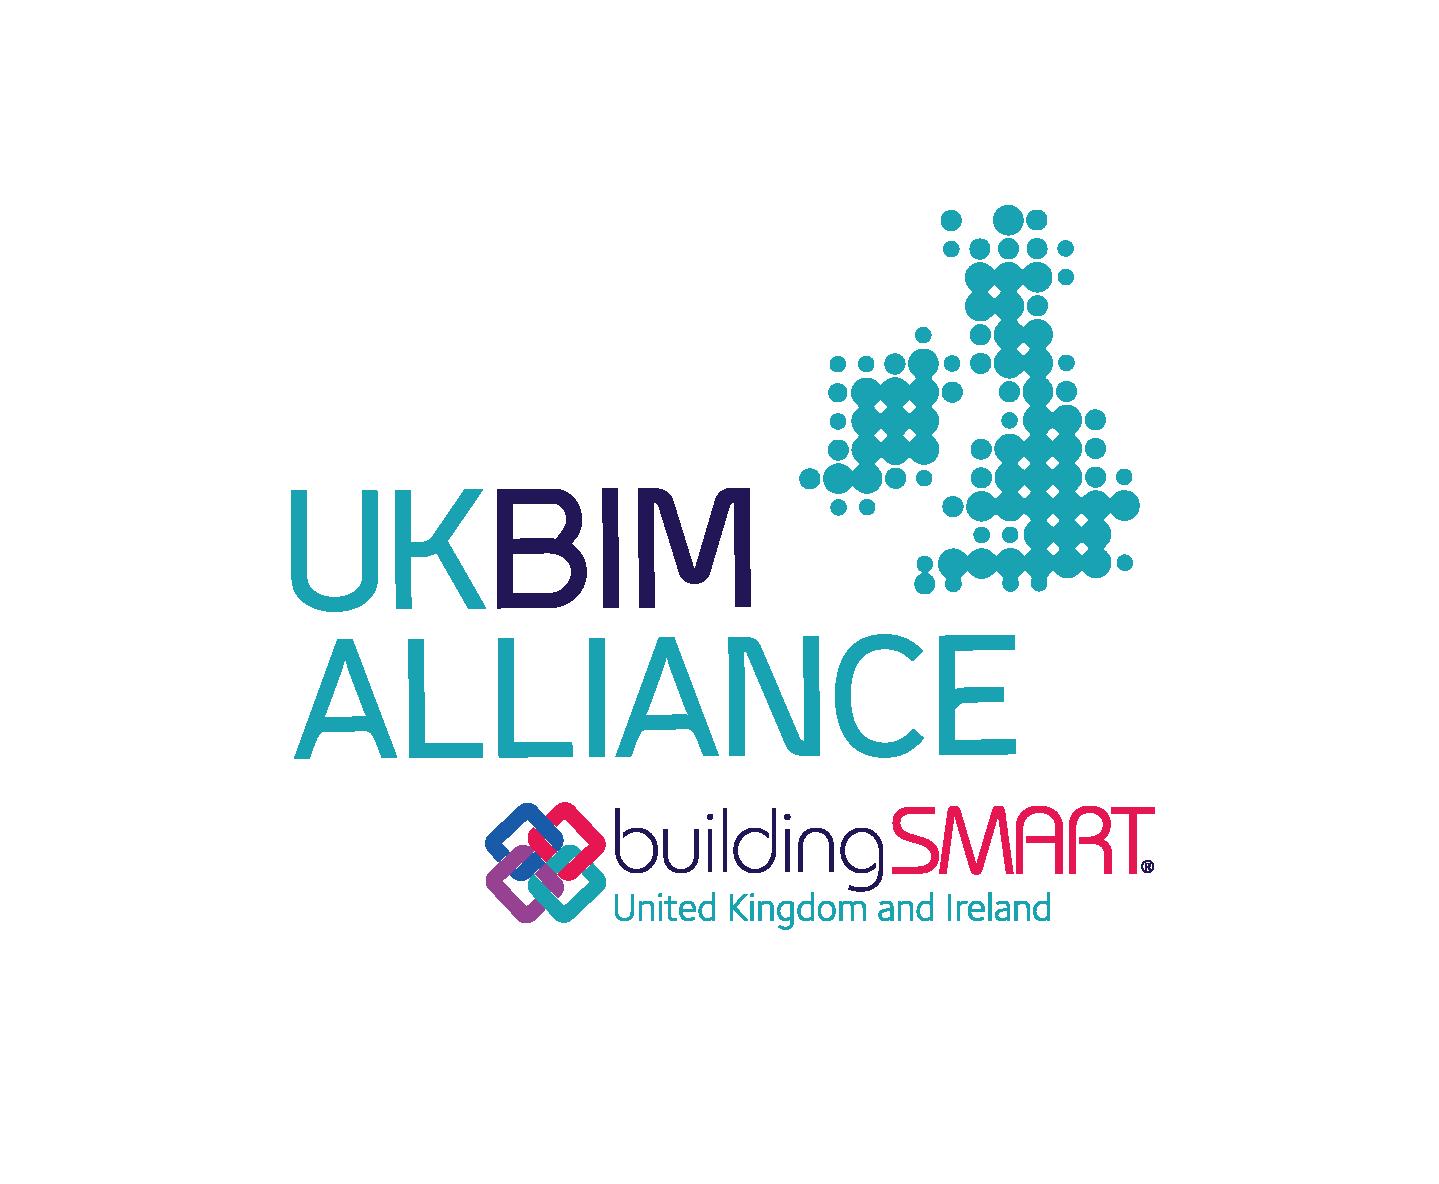 UKBIMAlliance_Logos_blyeblue_with_bSUKI.png